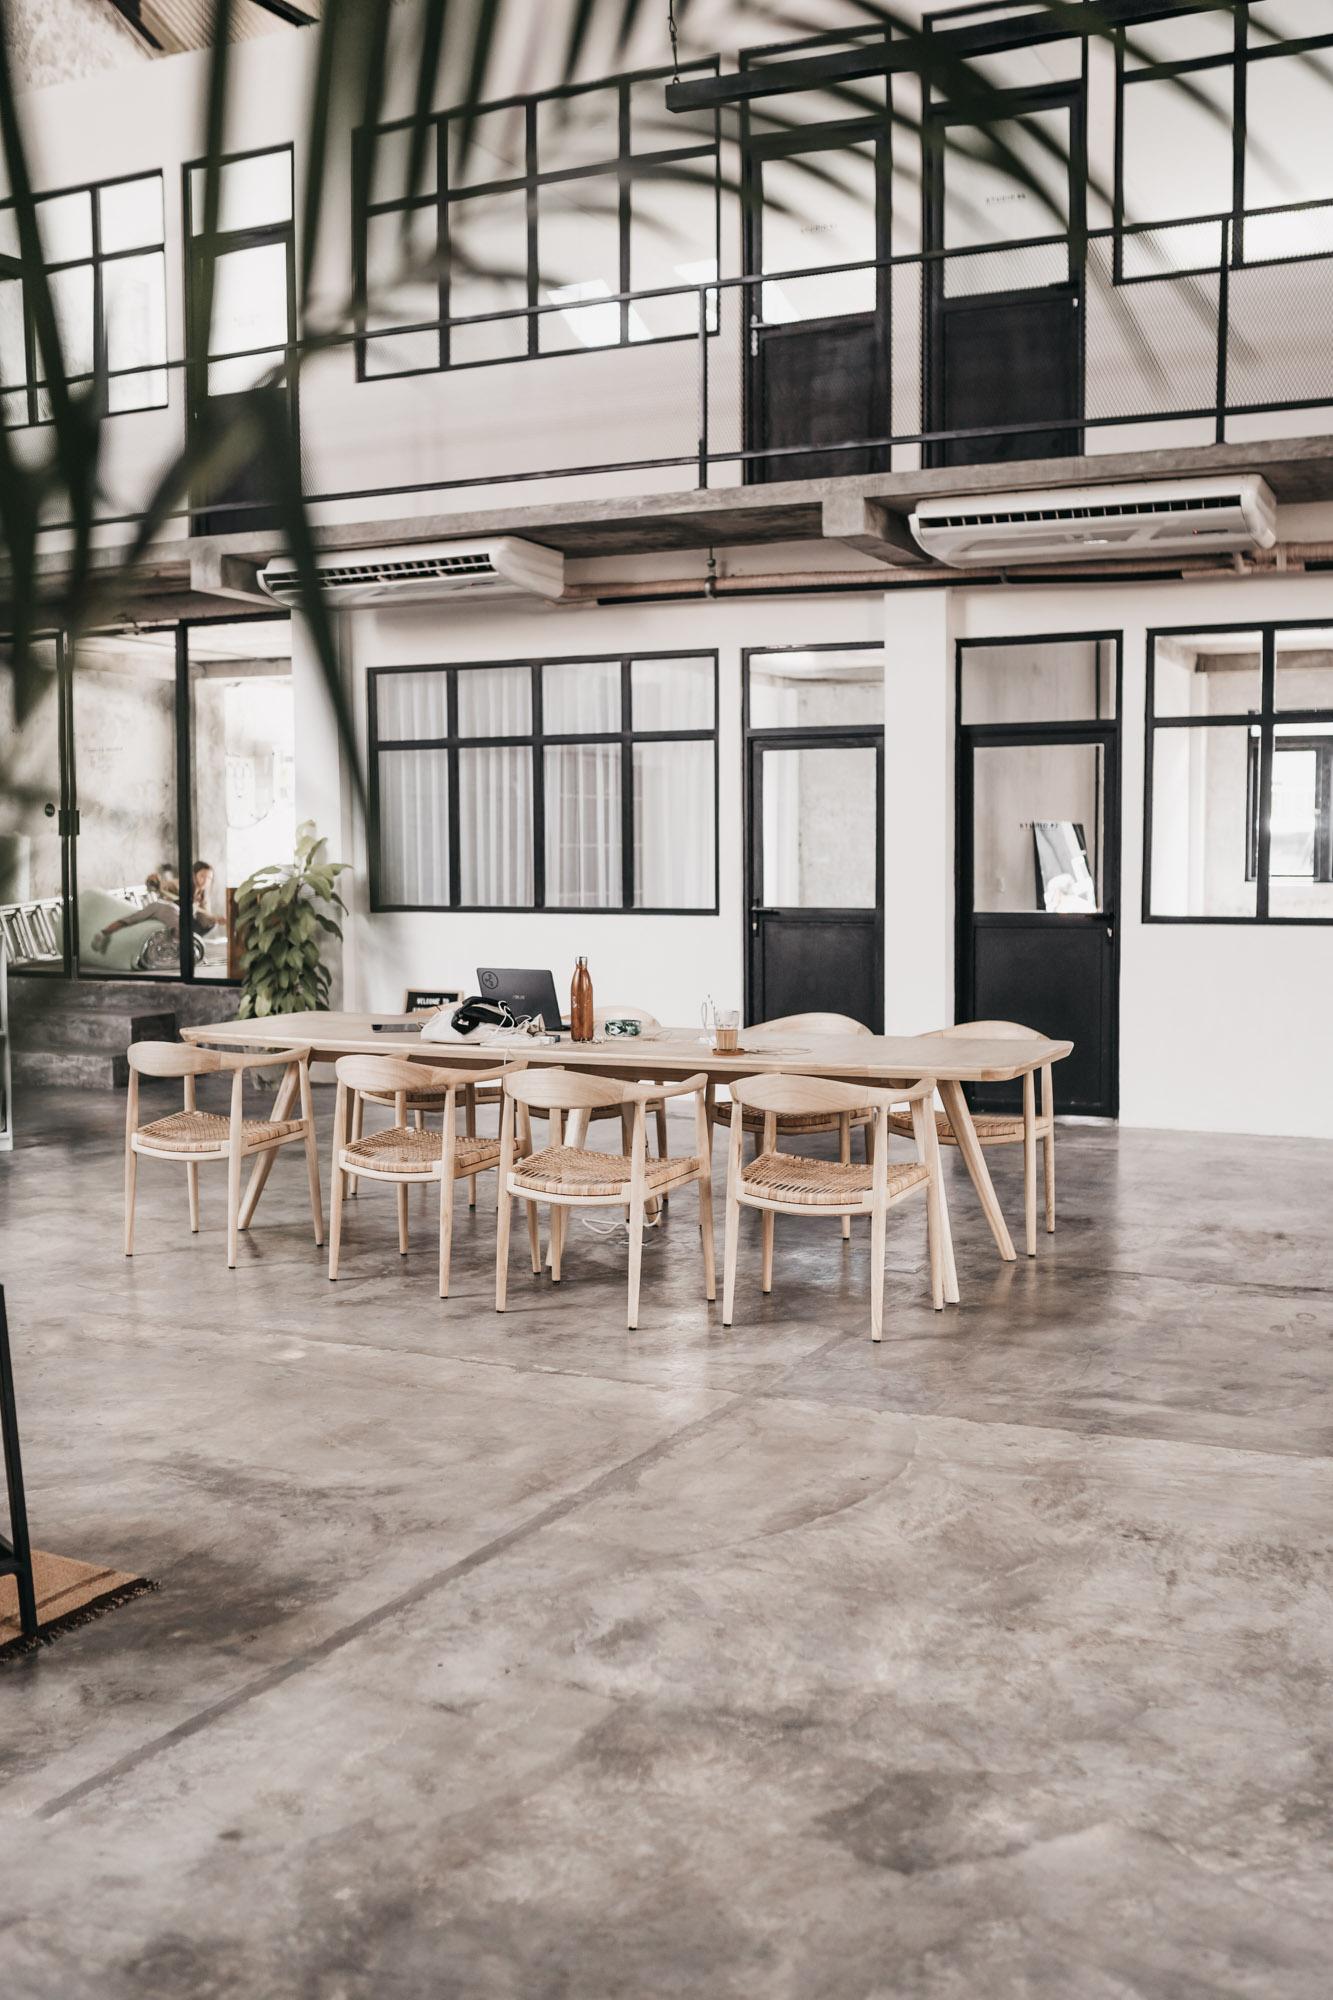 keira-mason-kinship-studio-coworking-space-design.jpg